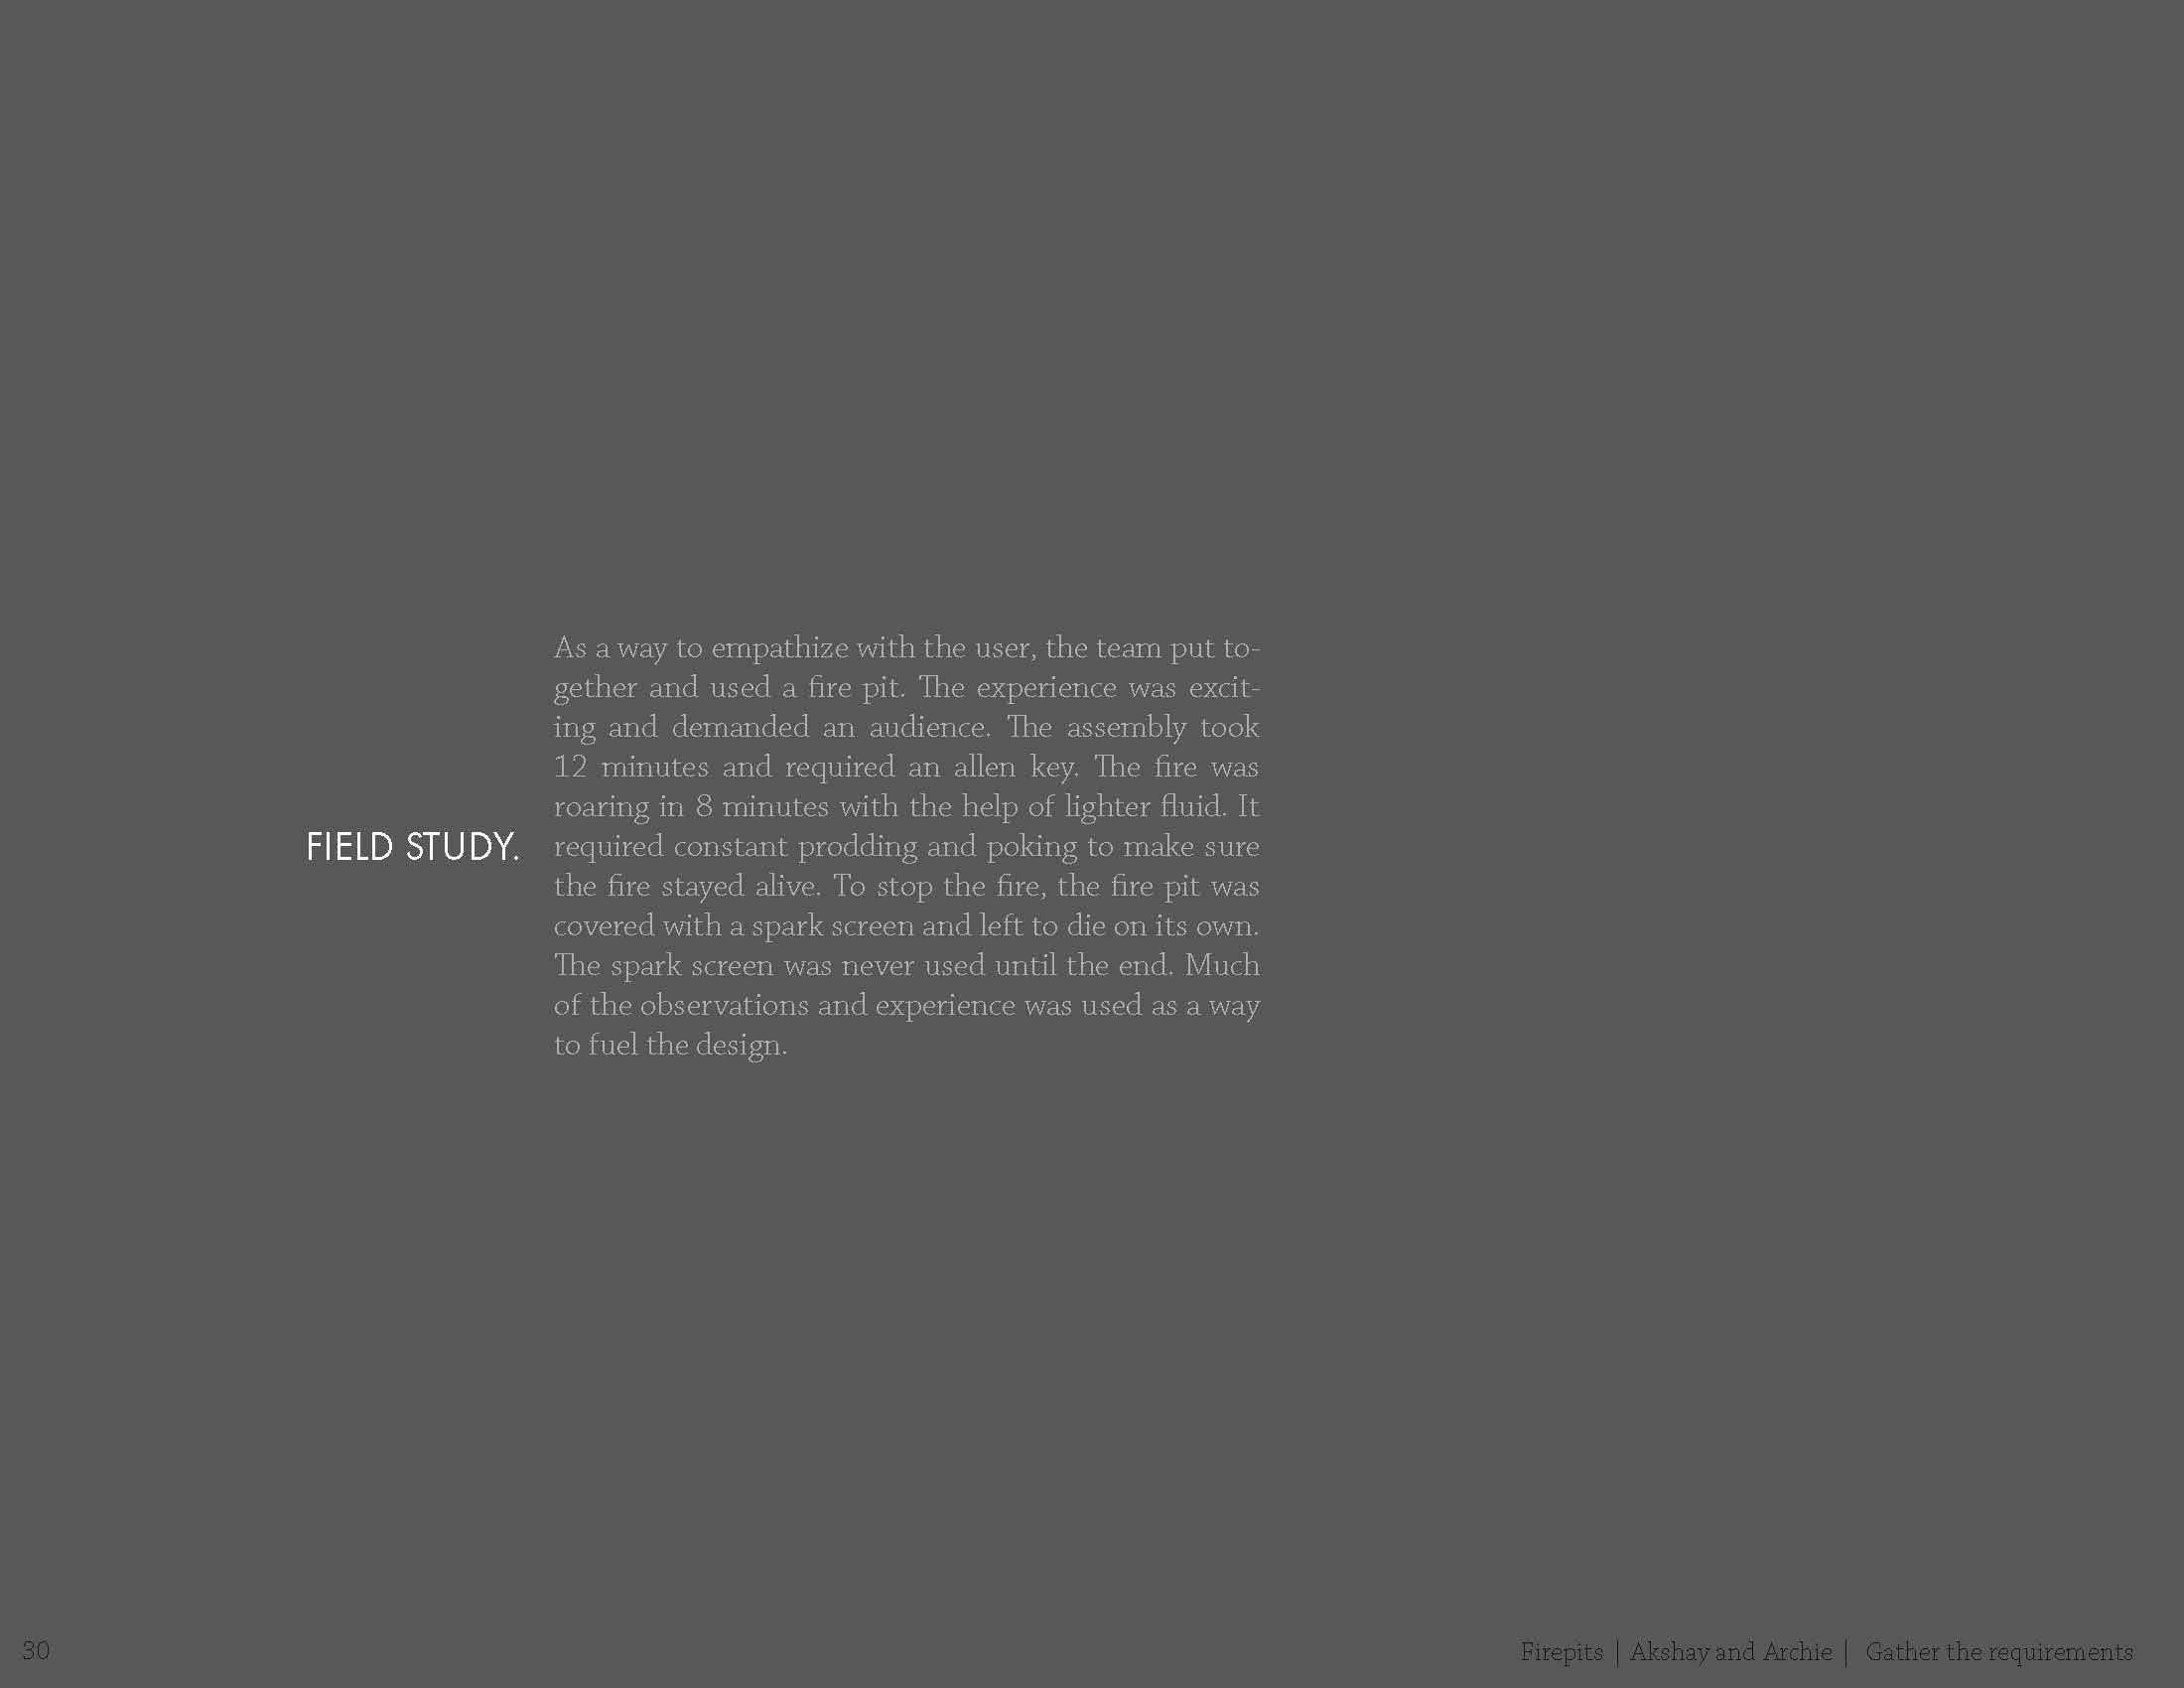 Firepit_Page_30.jpg